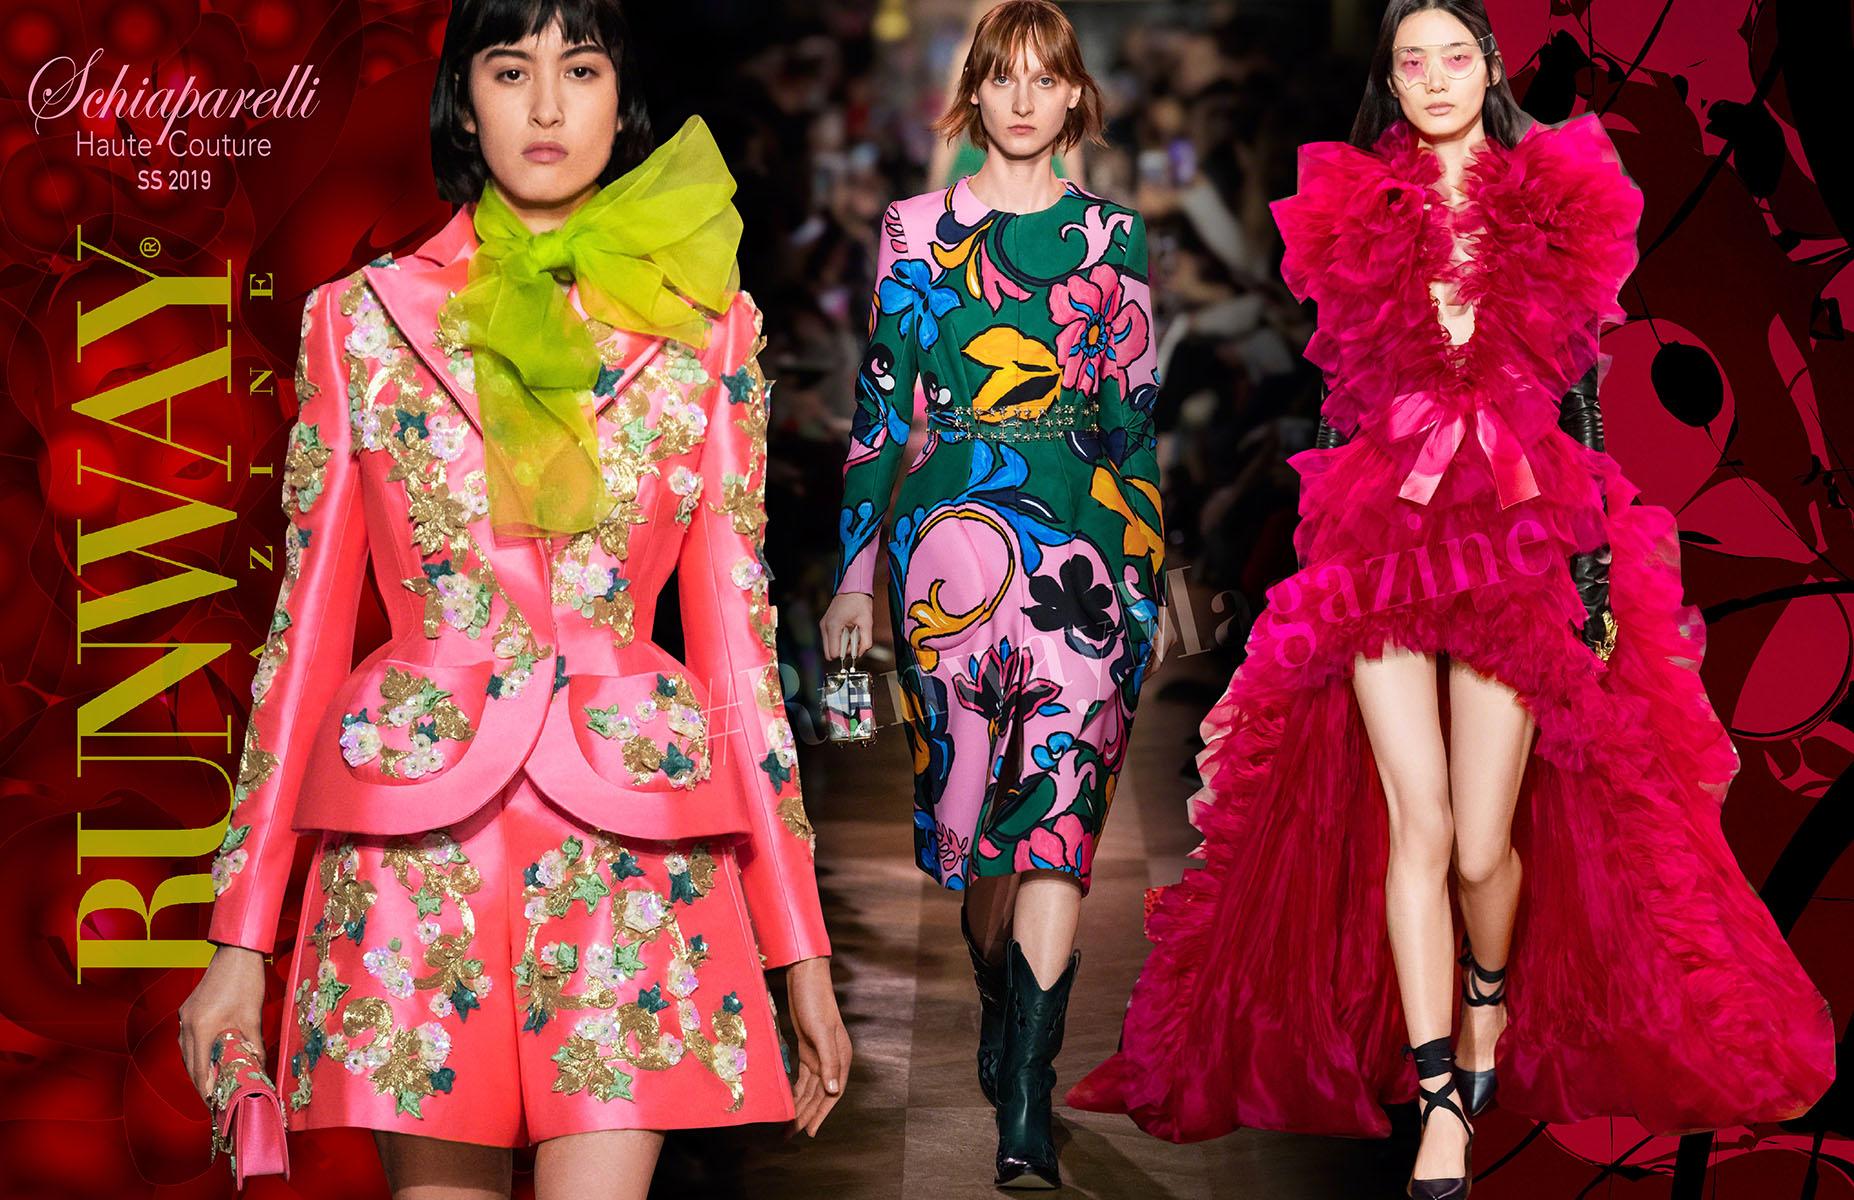 Schiaparelli Haute Couture Spring Summer 2019 by Runway Magazine